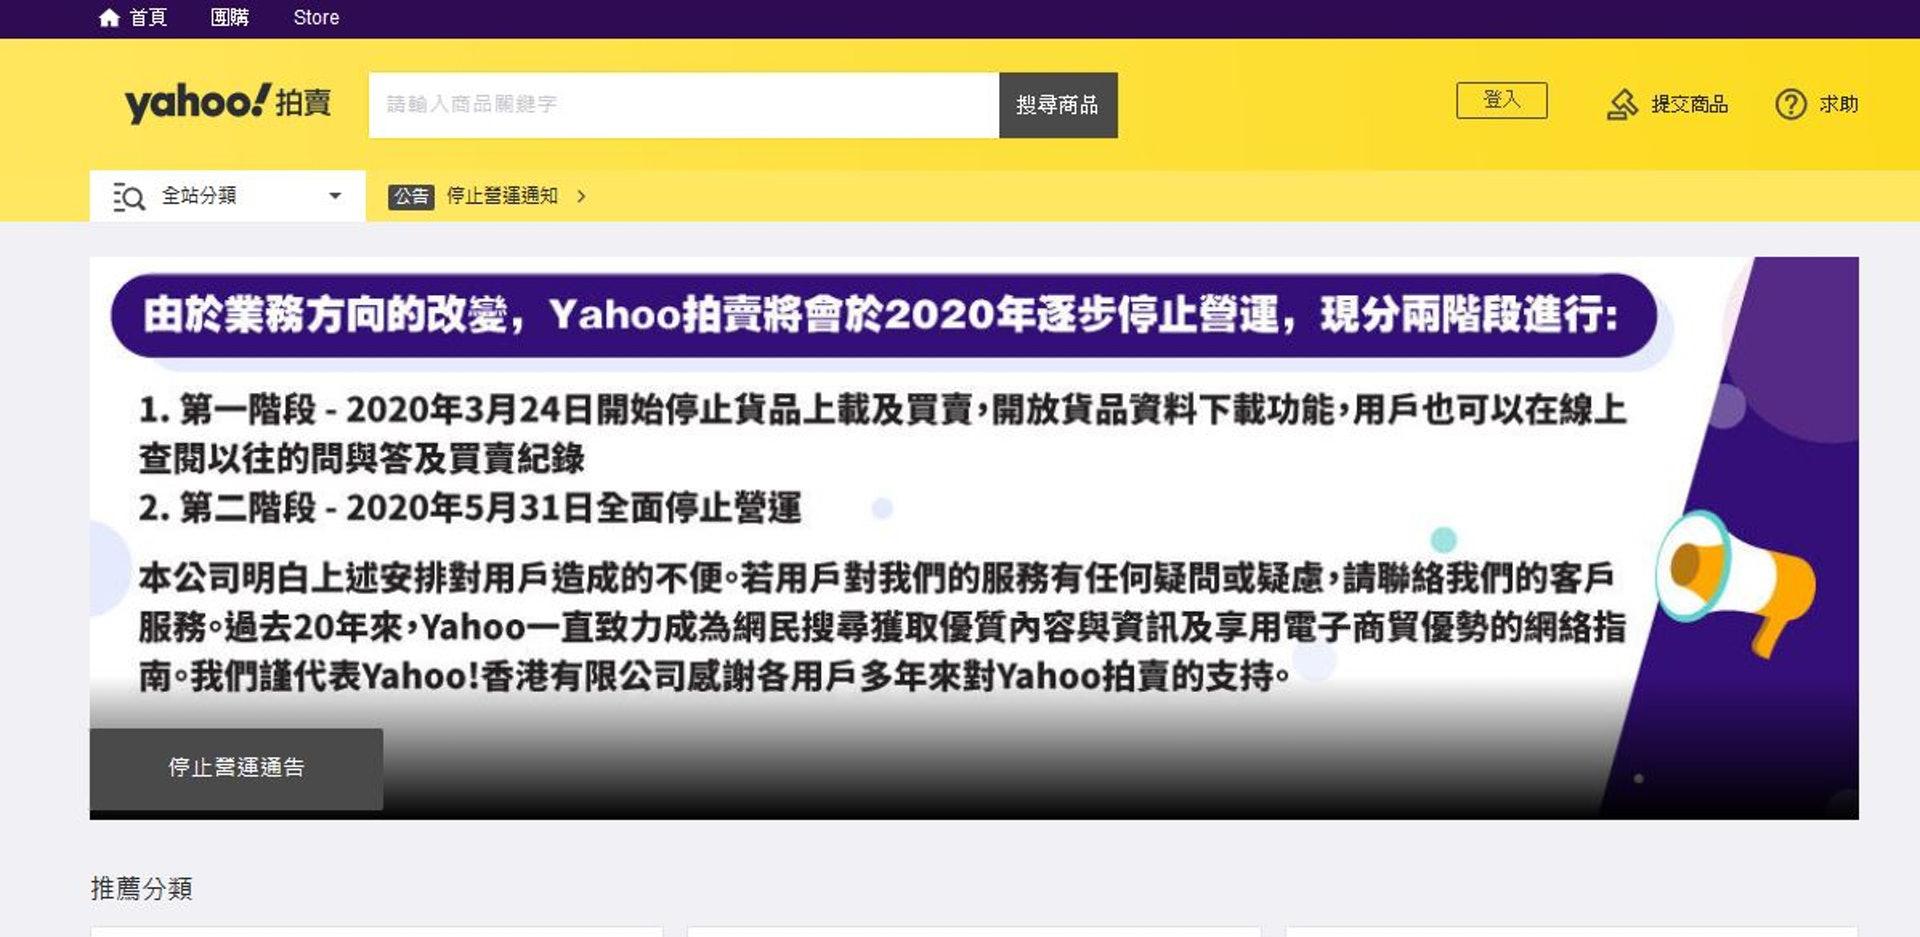 Yahoo拍賣於網站公布停止營運安排。(Yahoo拍賣)